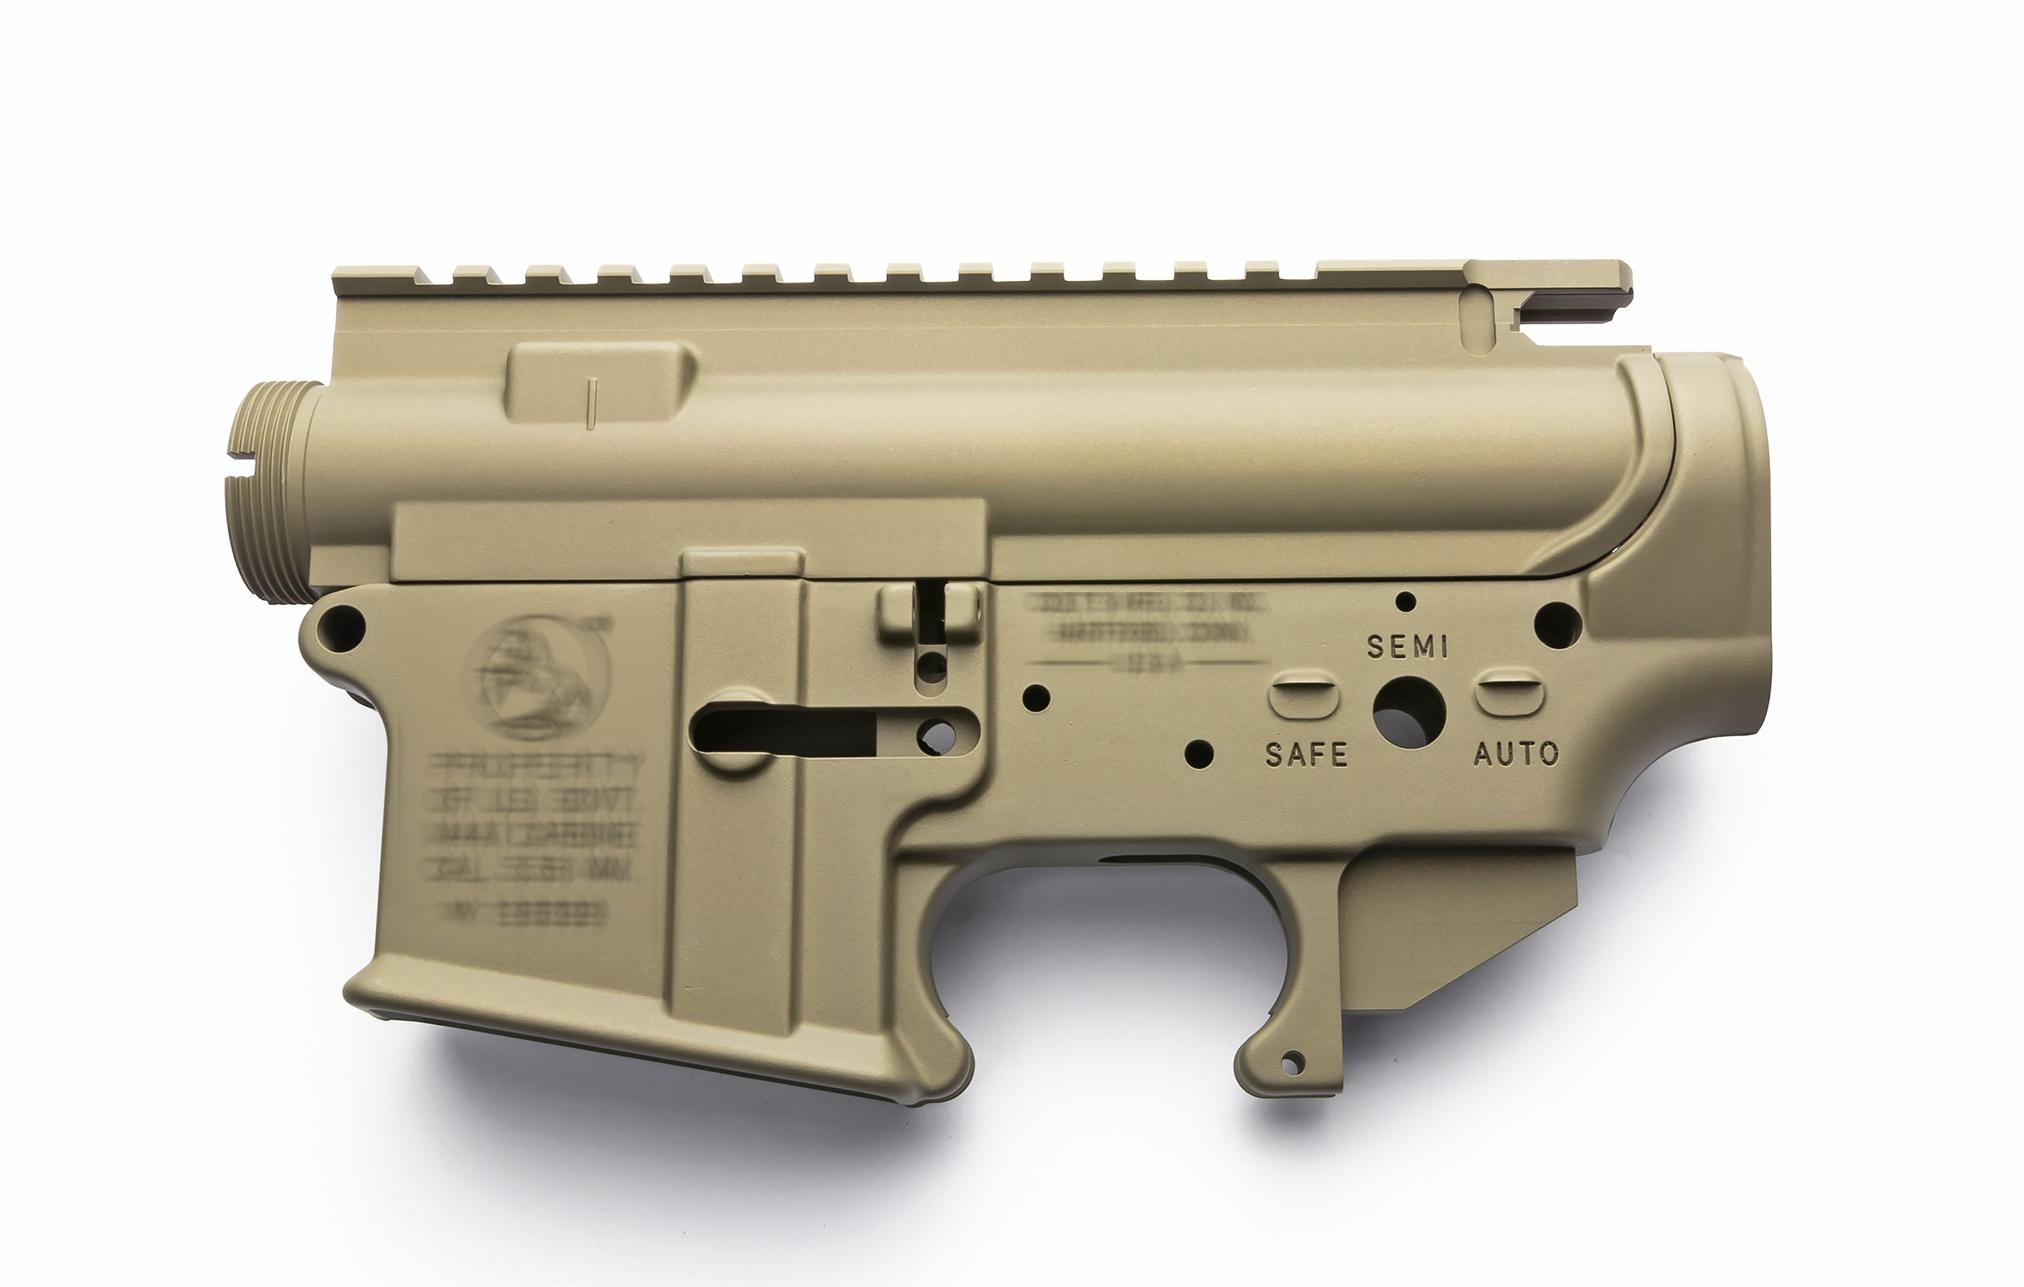 RA-TECH/SDP 鍛造7075アルミレシーバーセット WE AR M4 M16用 FDE (COLT MK18 MOD1)